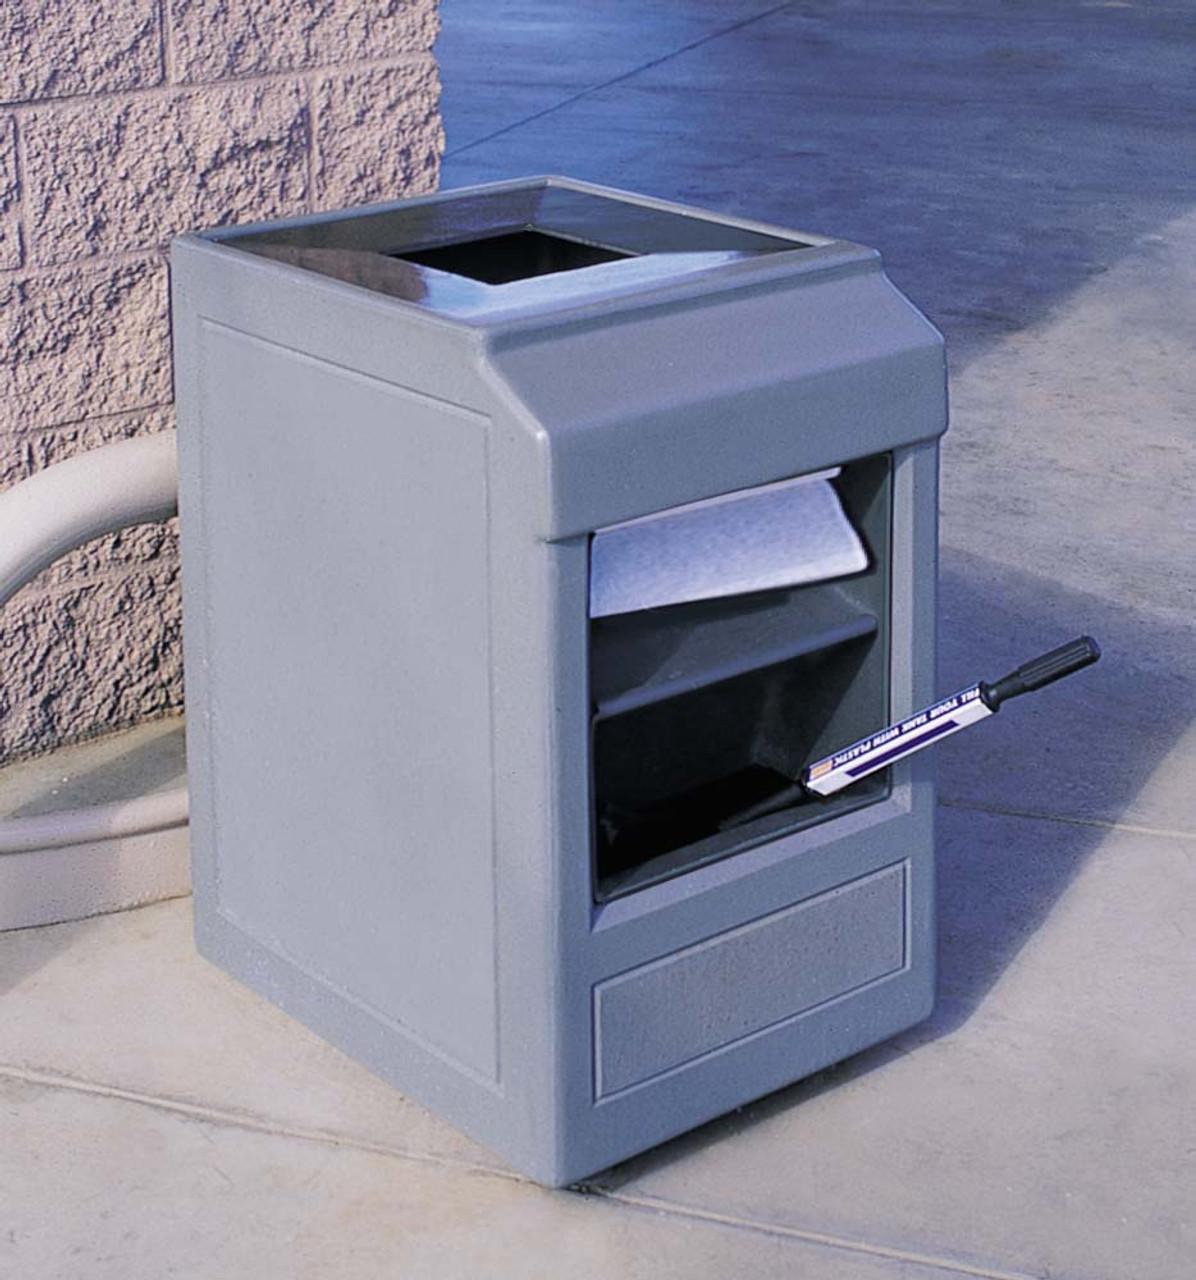 30 Gallon Concrete Auto Attendant Outdoor Waste Container TF1241 Weatherstone Gray